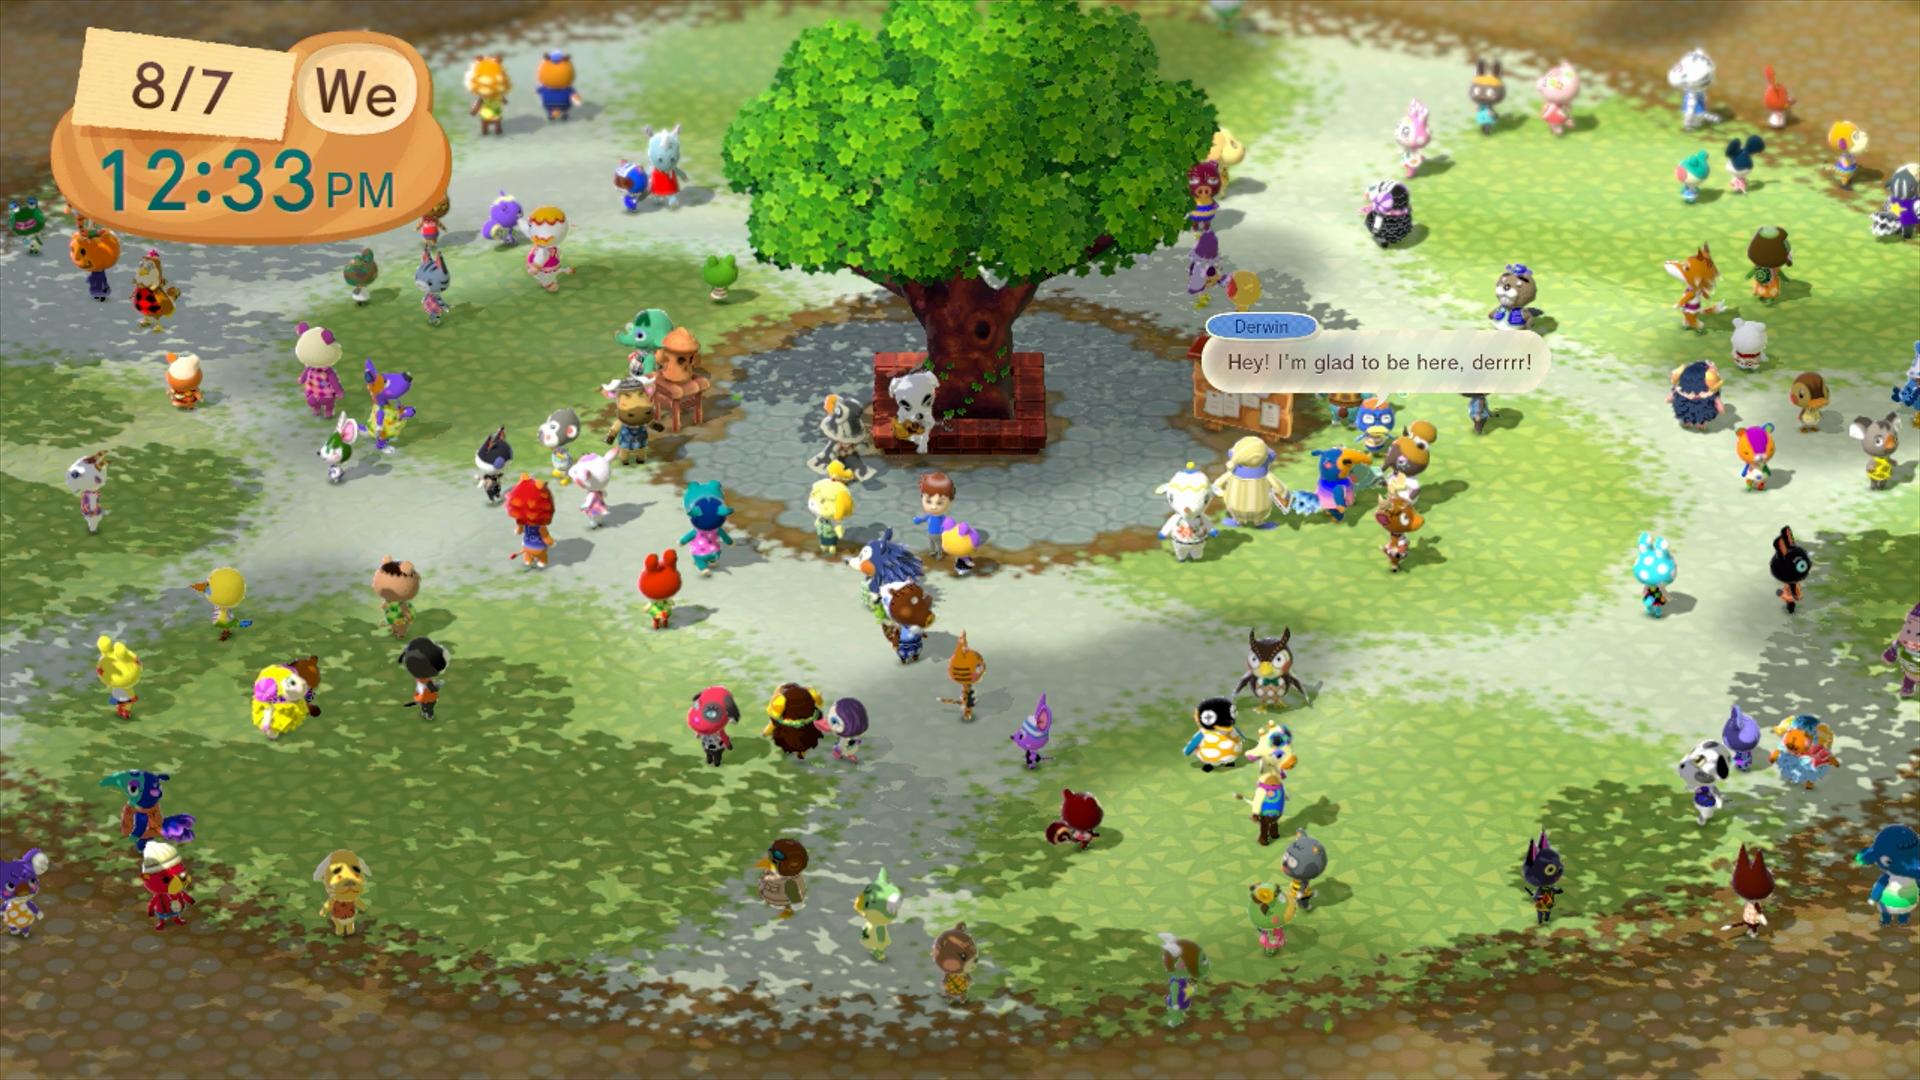 Animal Crossing Plaza Screenshot (Photo: Business Wire)